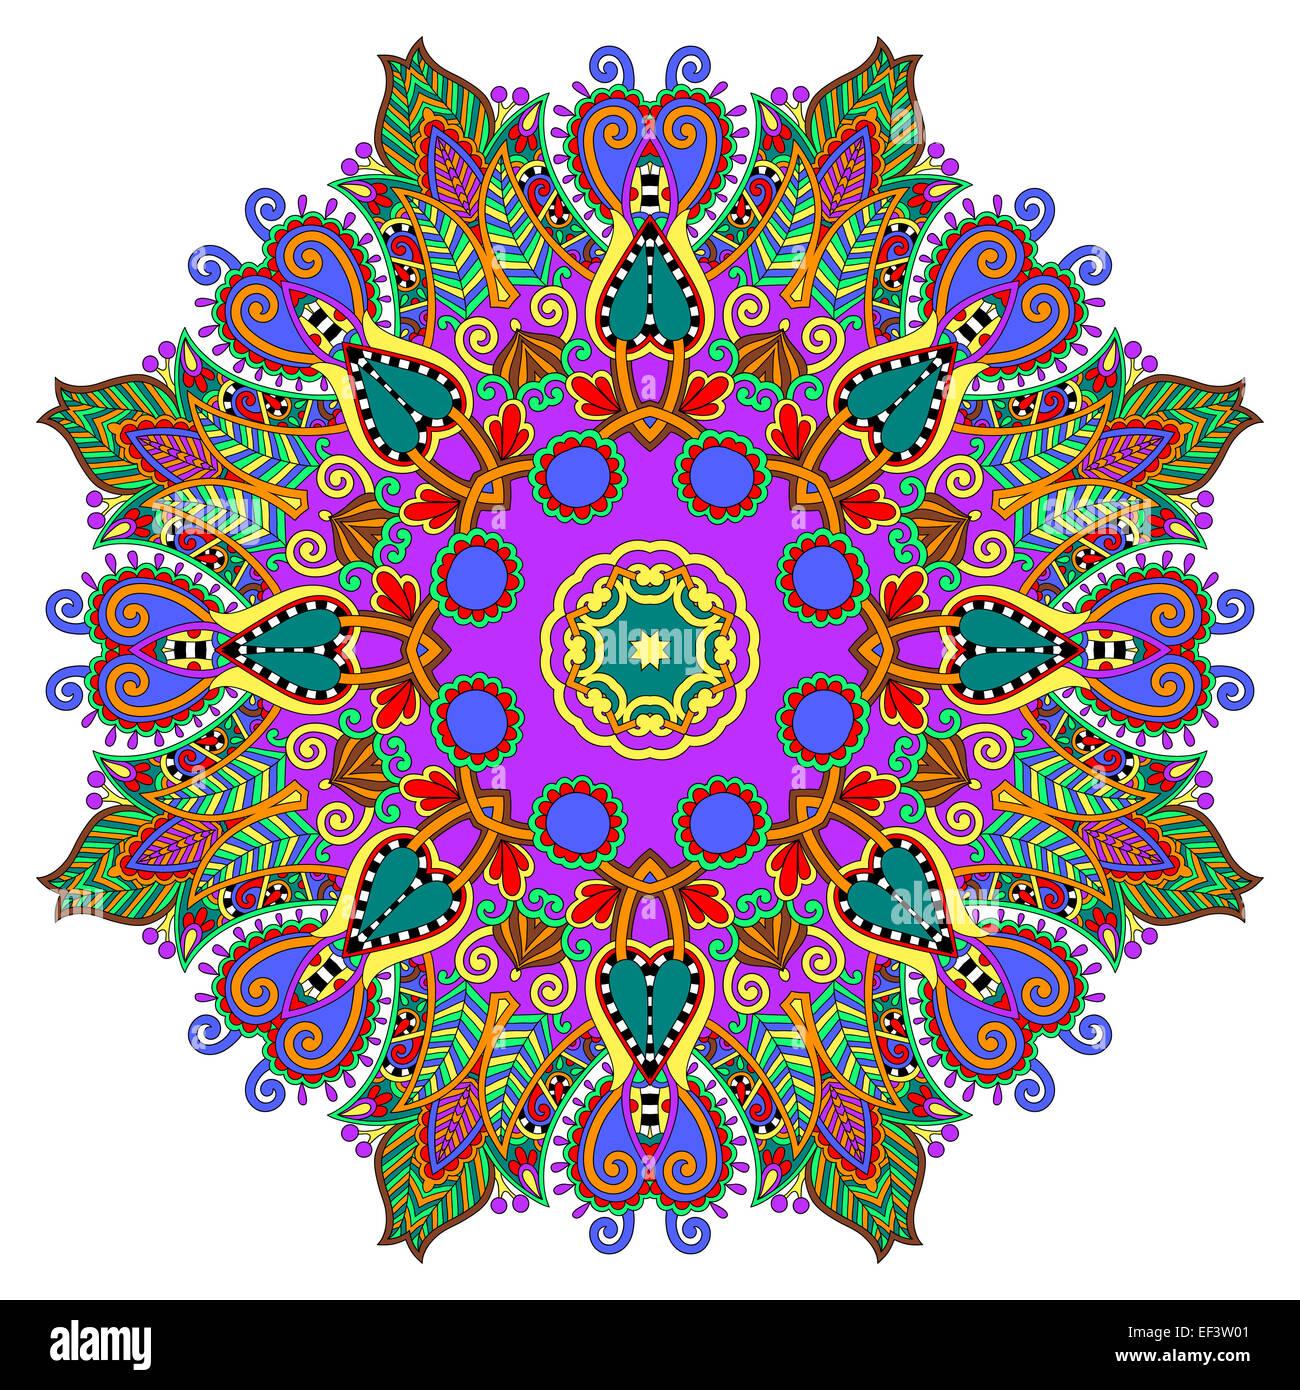 Circle decorative spiritual indian symbol of lotus flower stock circle decorative spiritual indian symbol of lotus flower mightylinksfo